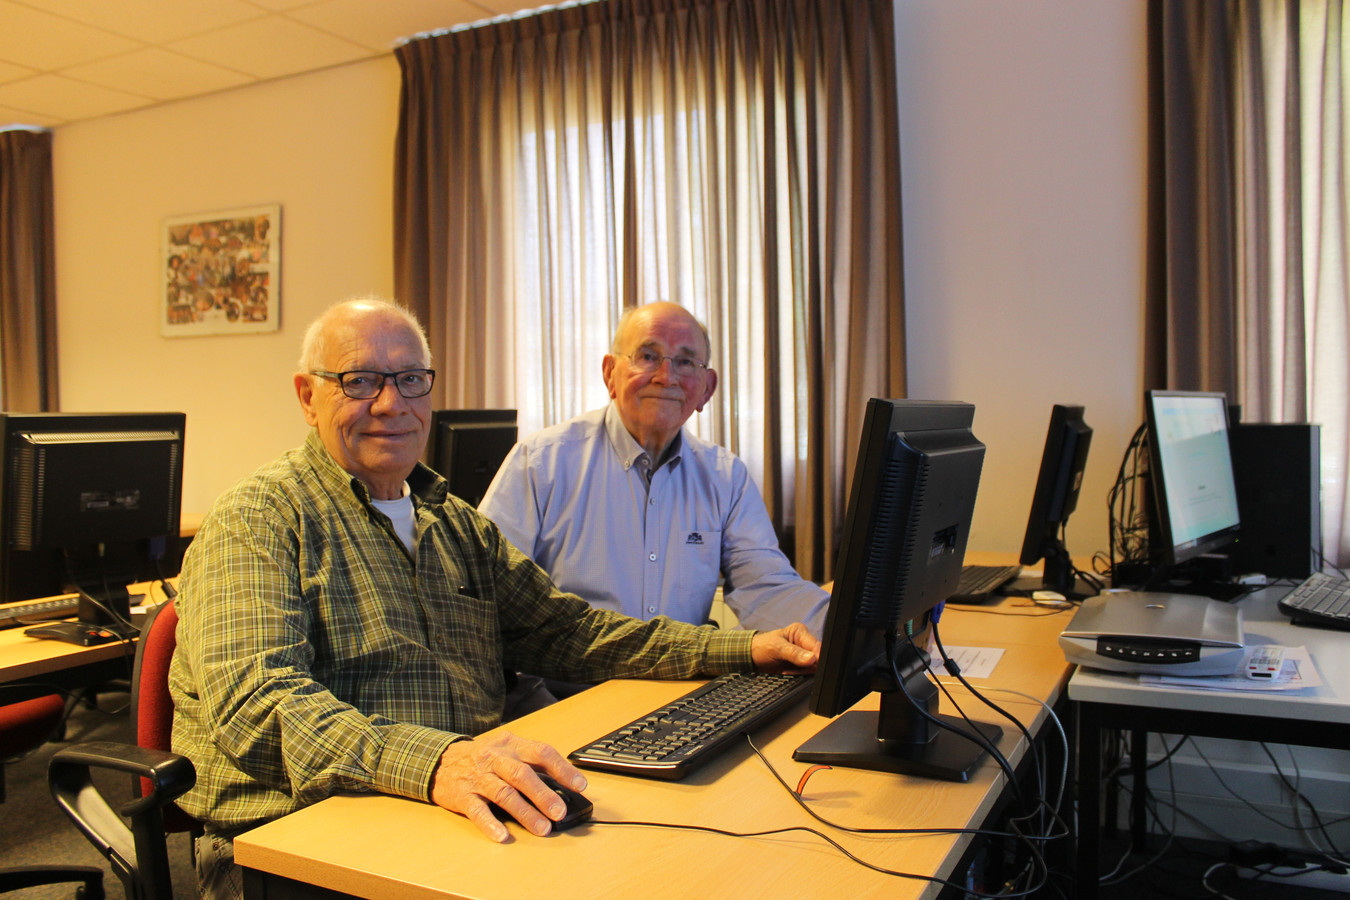 Vrijwilliger Johan Hoefnagels en voorzitter Peer Custers van Seniorcompas.